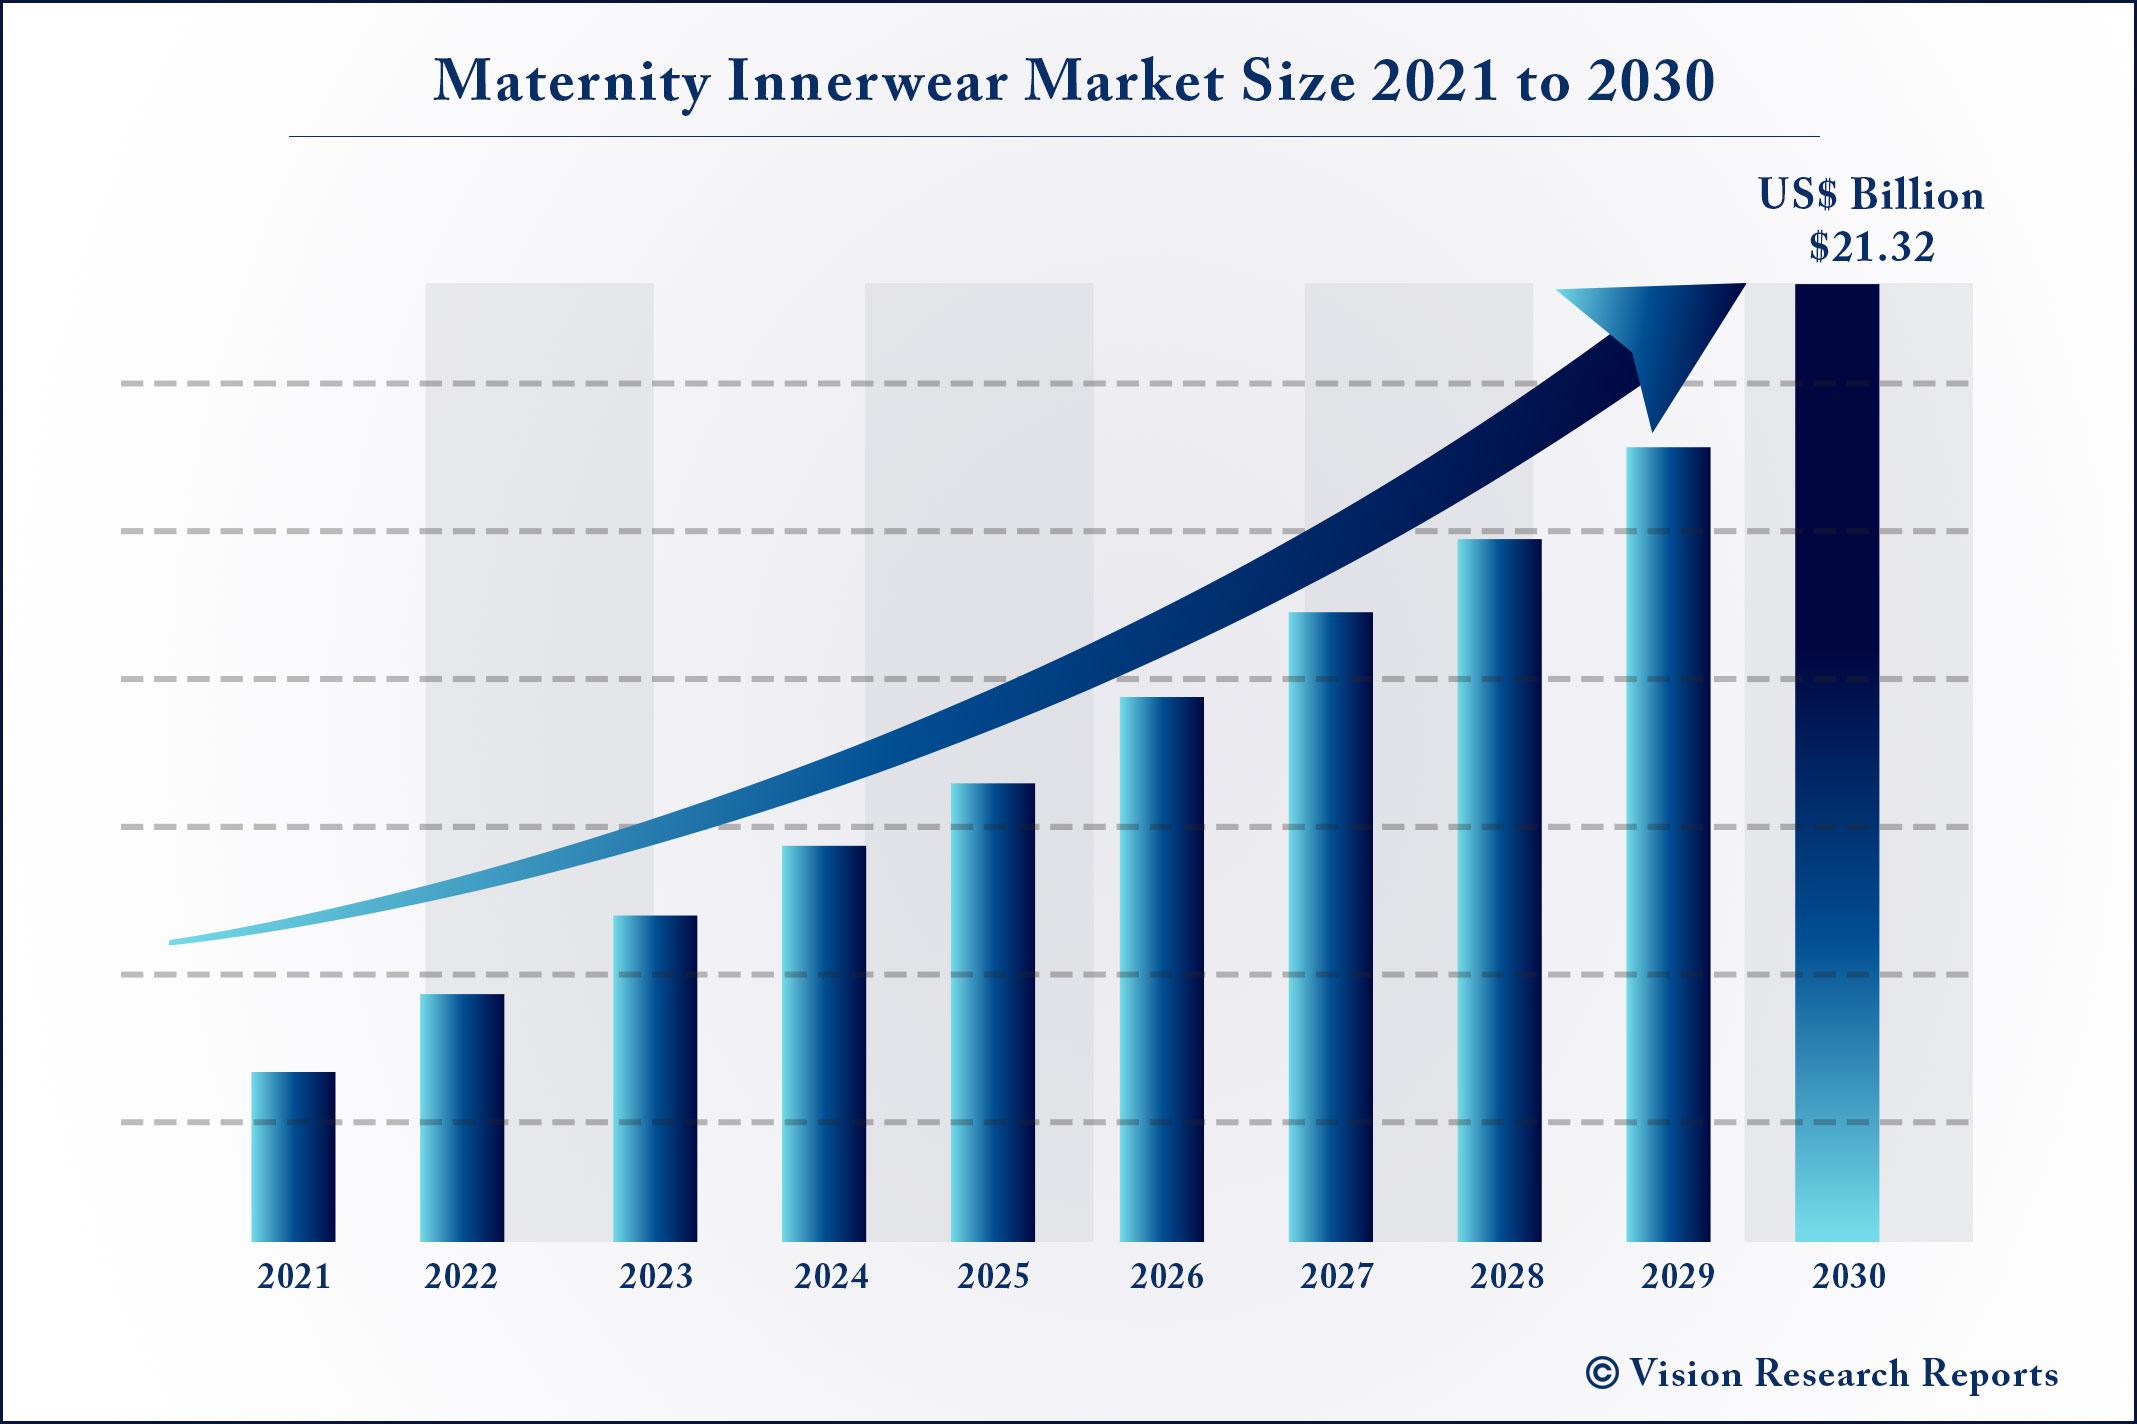 Maternity Innerwear Market Size 2021 to 2030